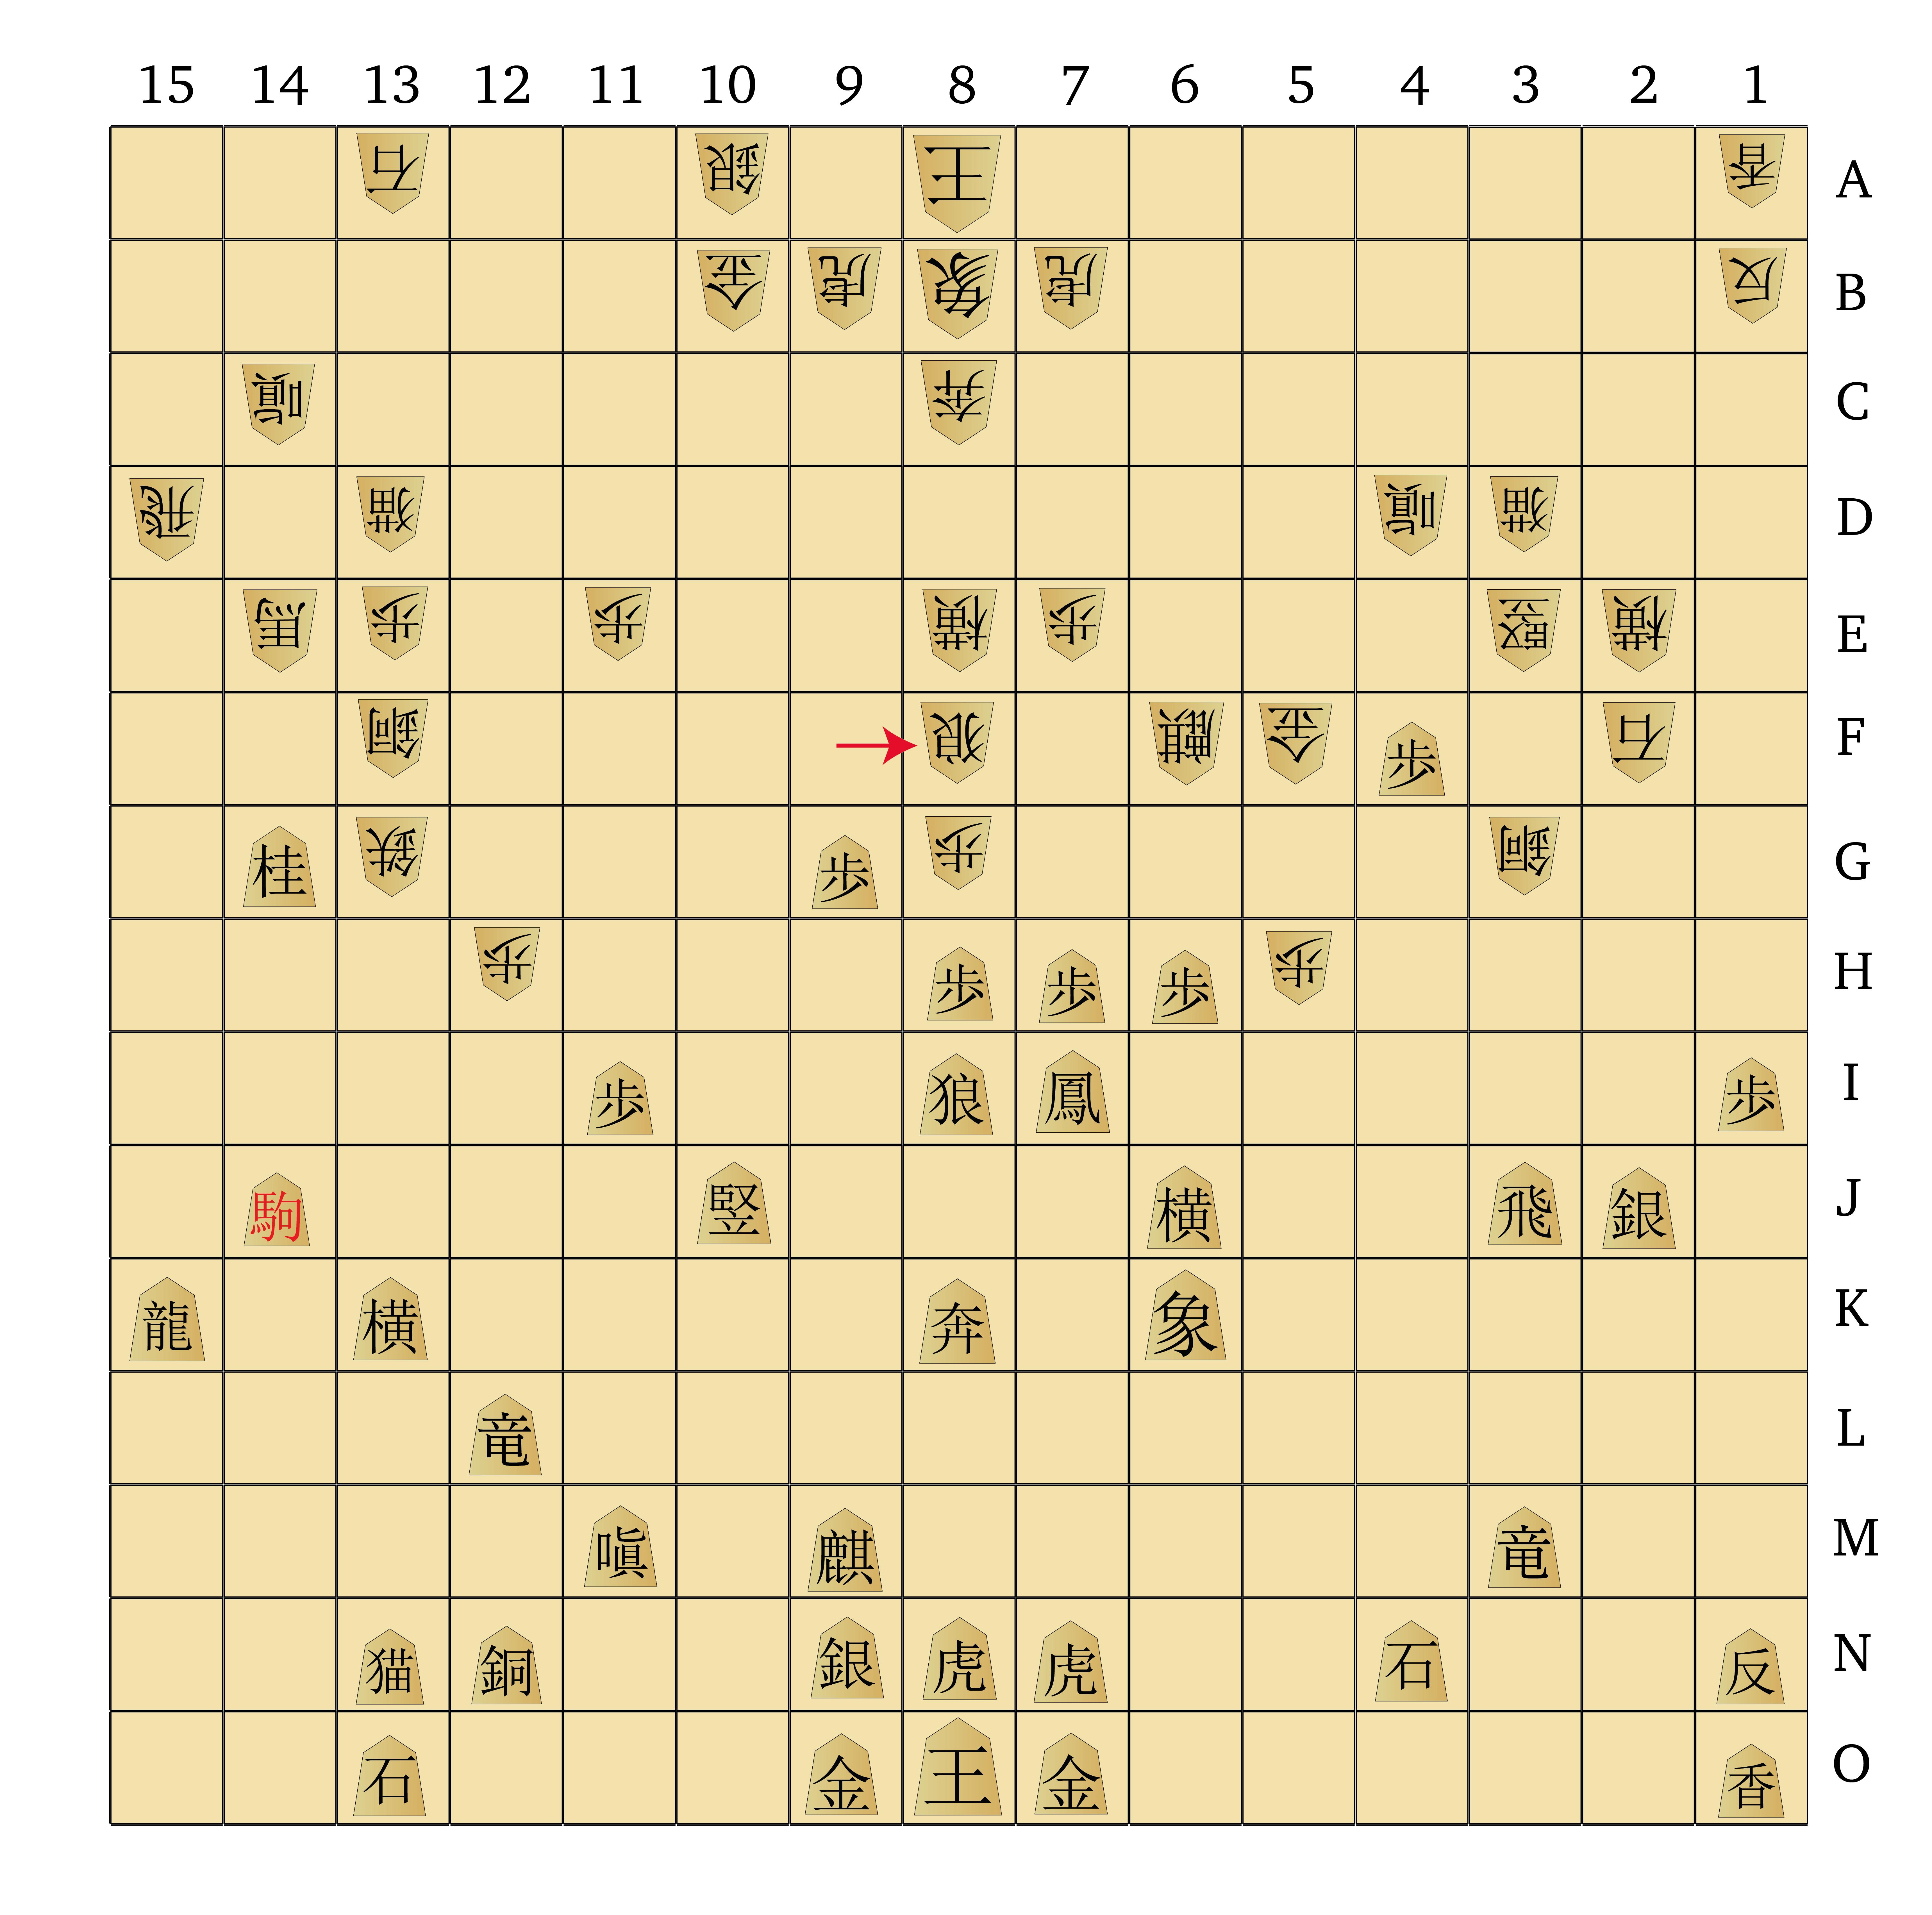 Dai Shogi 420 -- Move 400-01